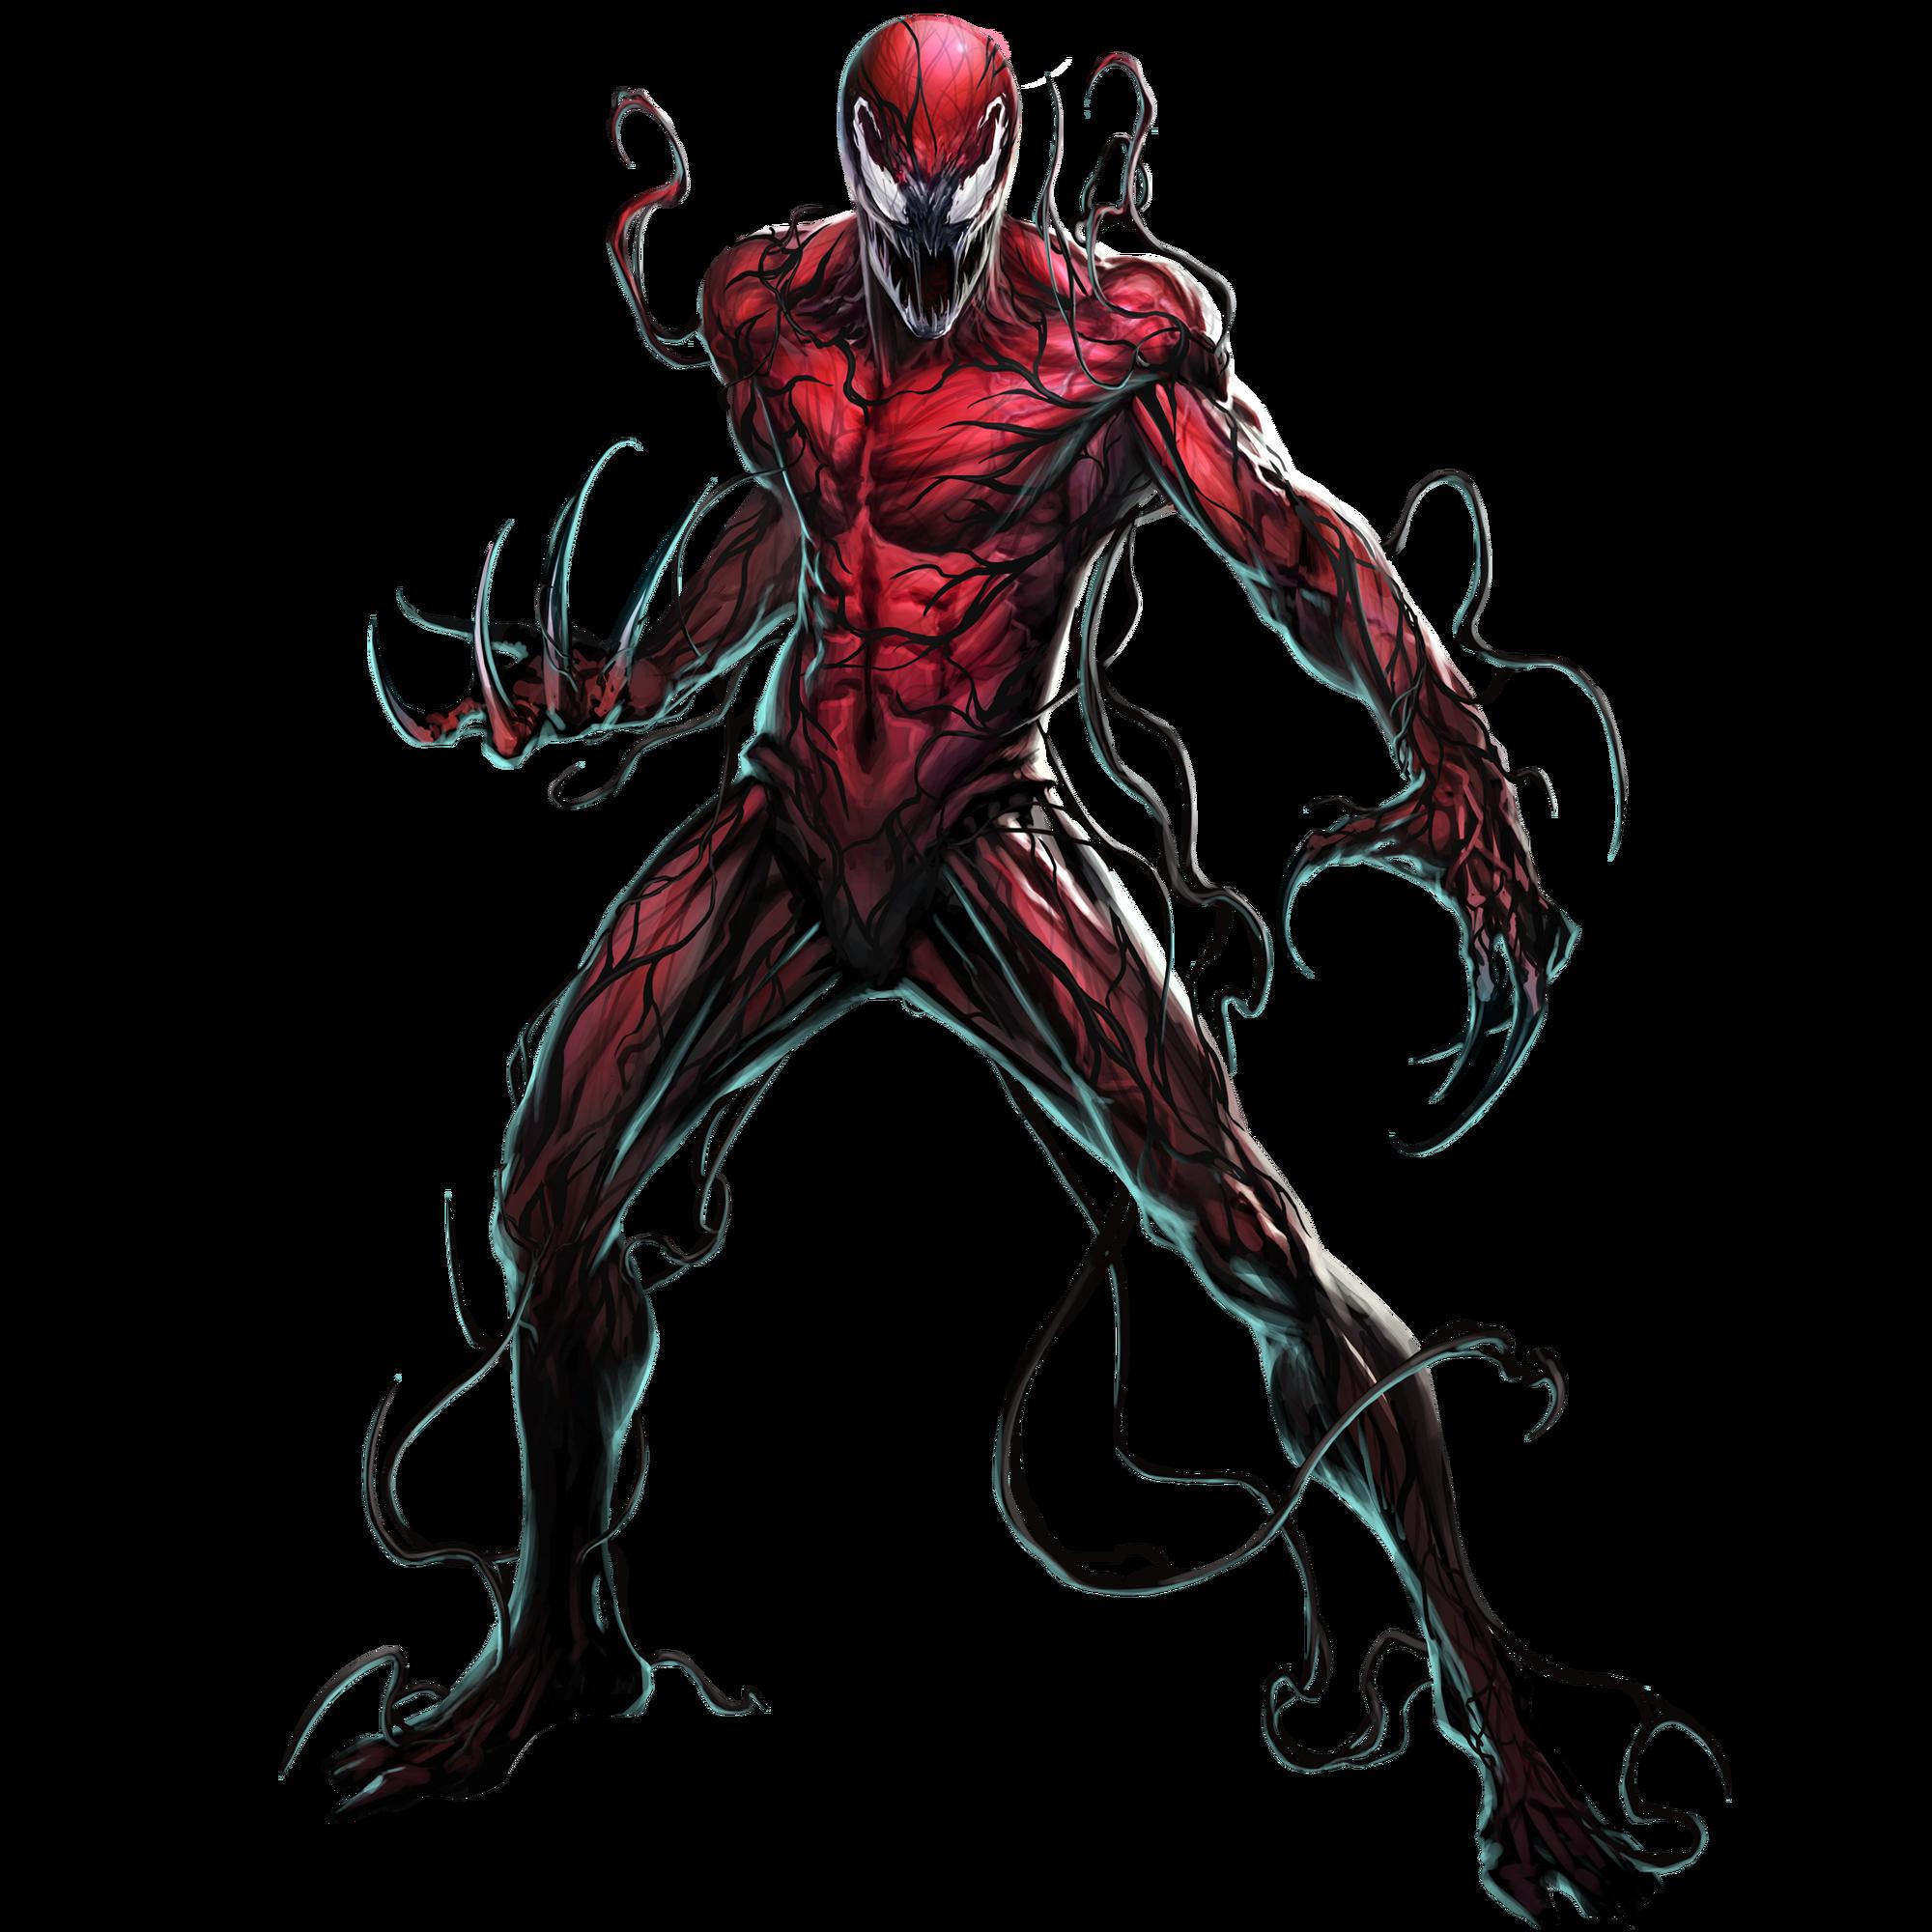 Carnage (Marvel Comics) | VS Battles Wiki | FANDOM powered ...